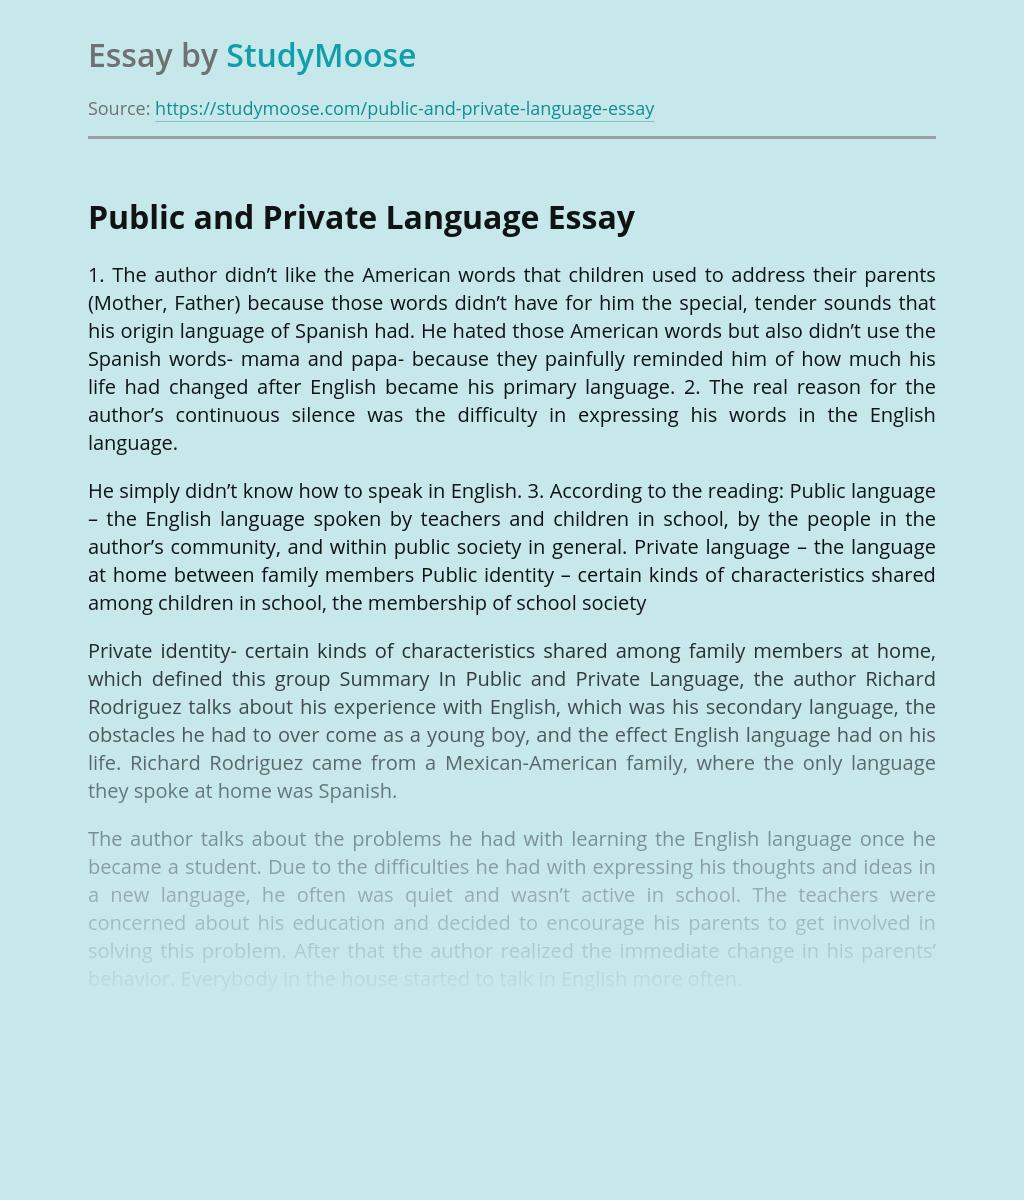 Public and Private Language